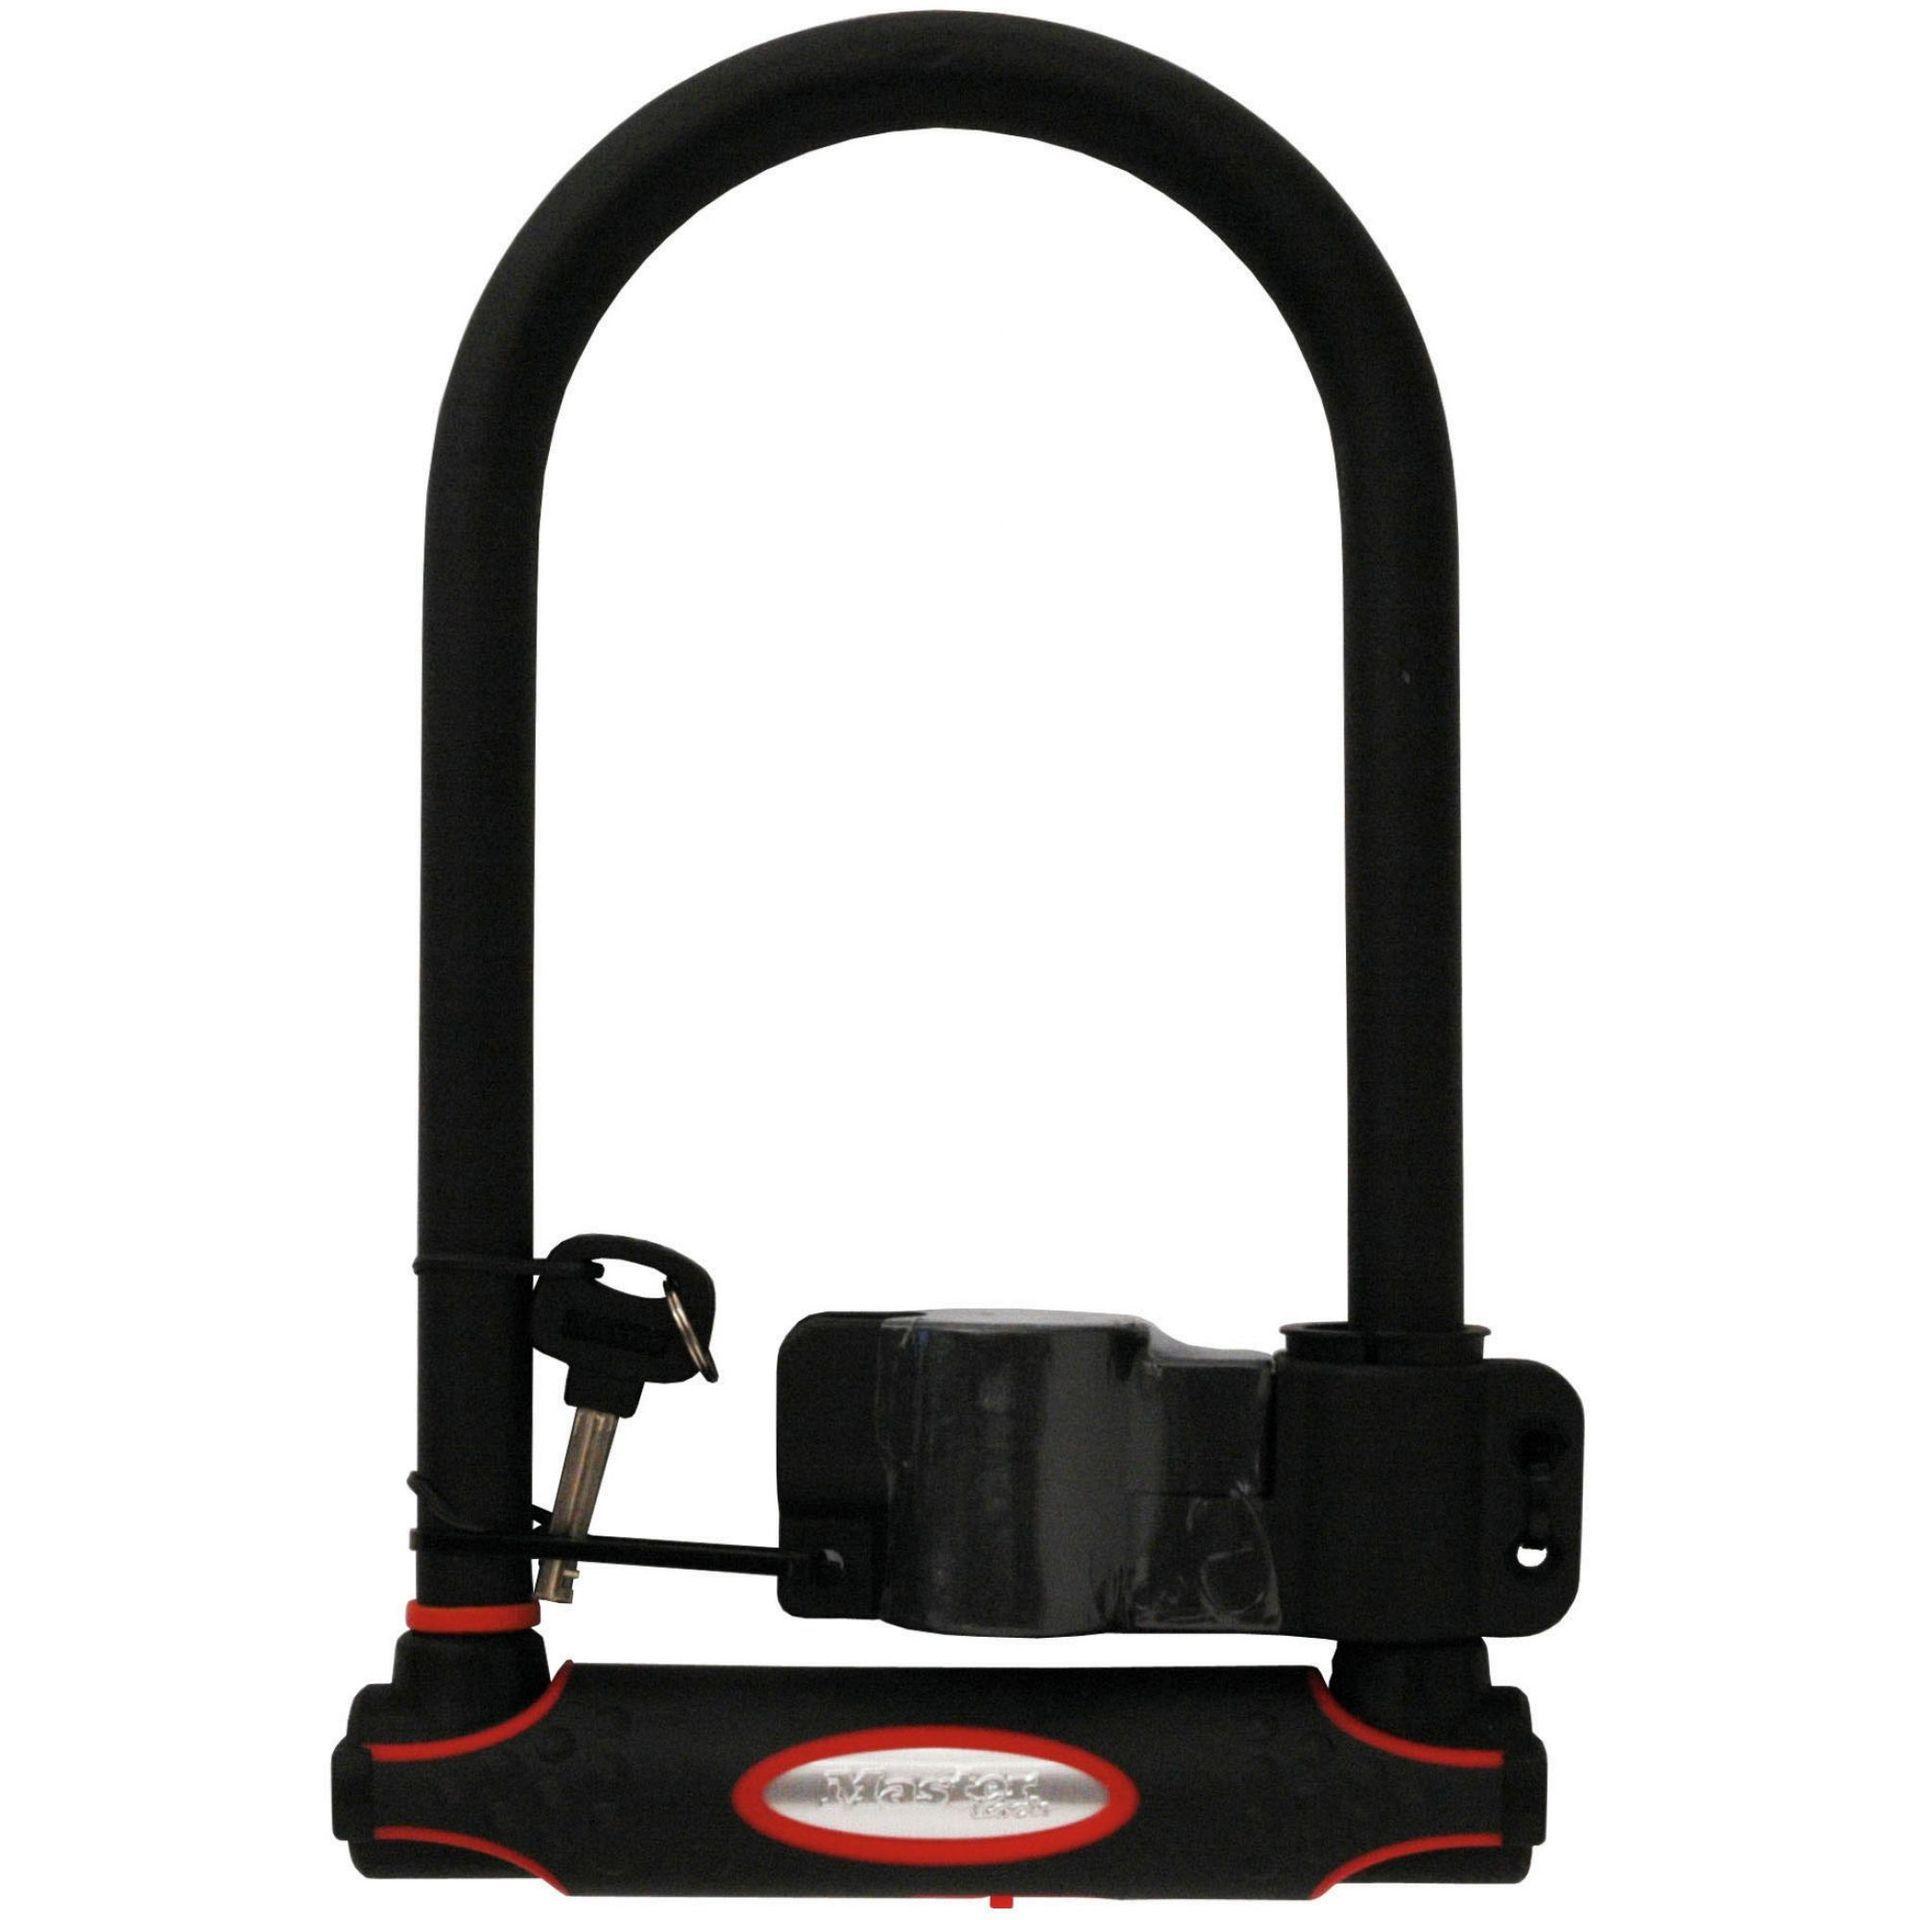 zapi cie rowerowe masterlock u lock 8196 czarny w. Black Bedroom Furniture Sets. Home Design Ideas